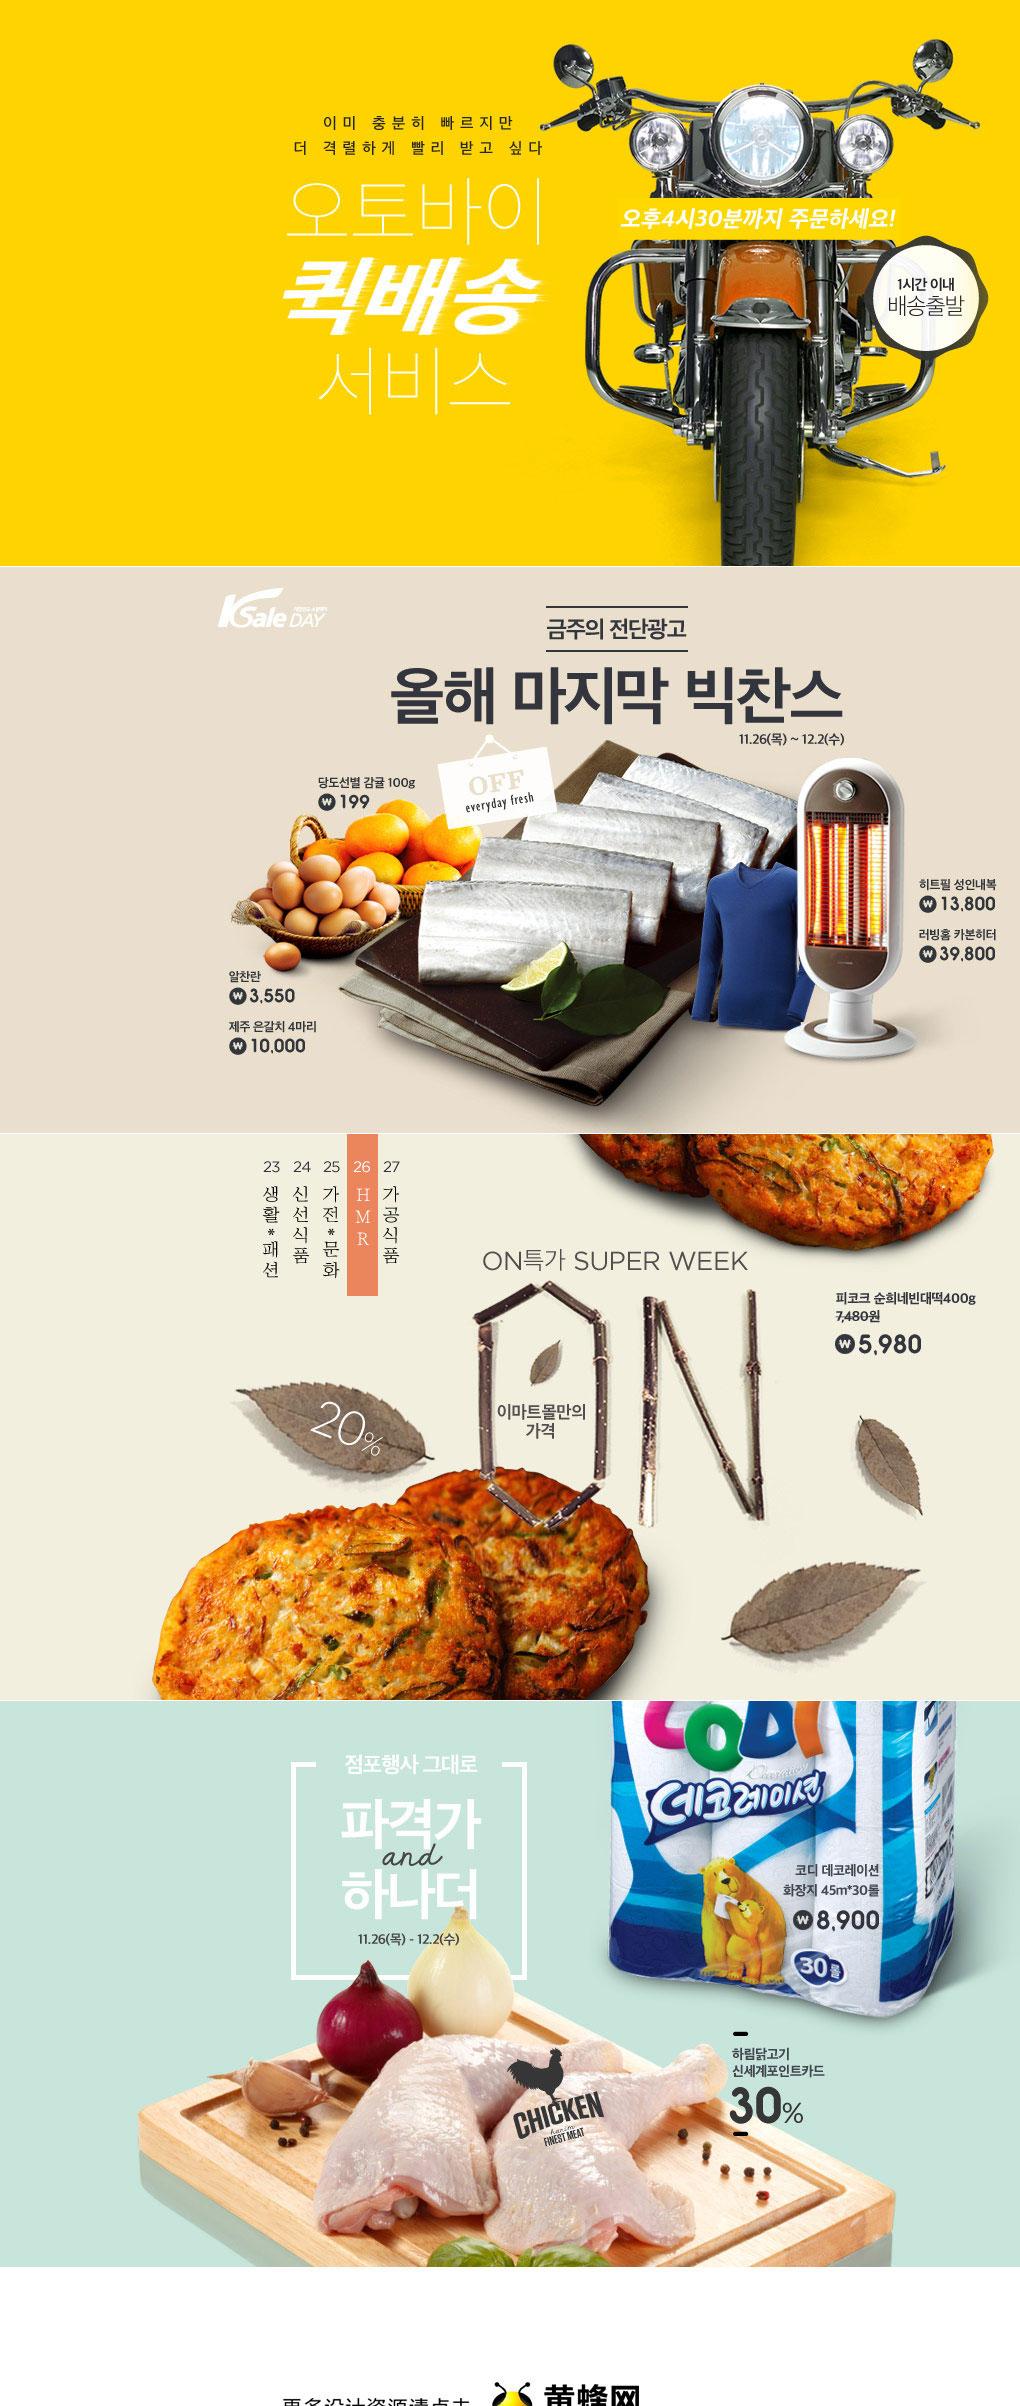 Emart生鲜网站banner设计